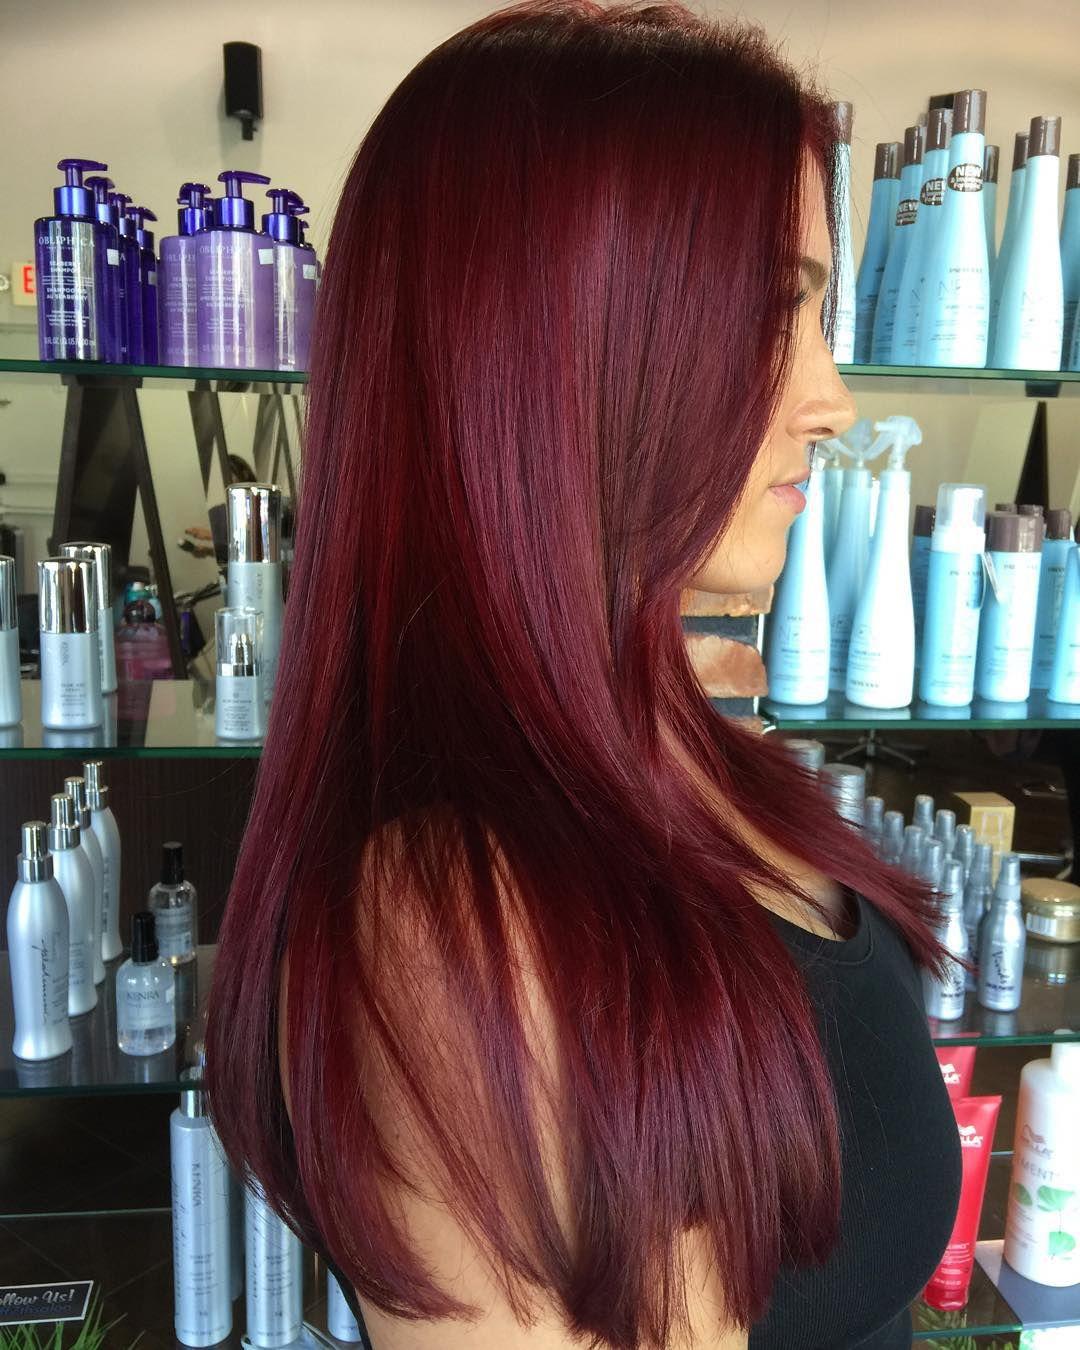 45 Shades Of Burgundy Hair Dark Burgundy Maroon Burgundy With Red Purple And Brown Highlights Auburn Red Hair Color Wine Hair Shades Of Red Hair